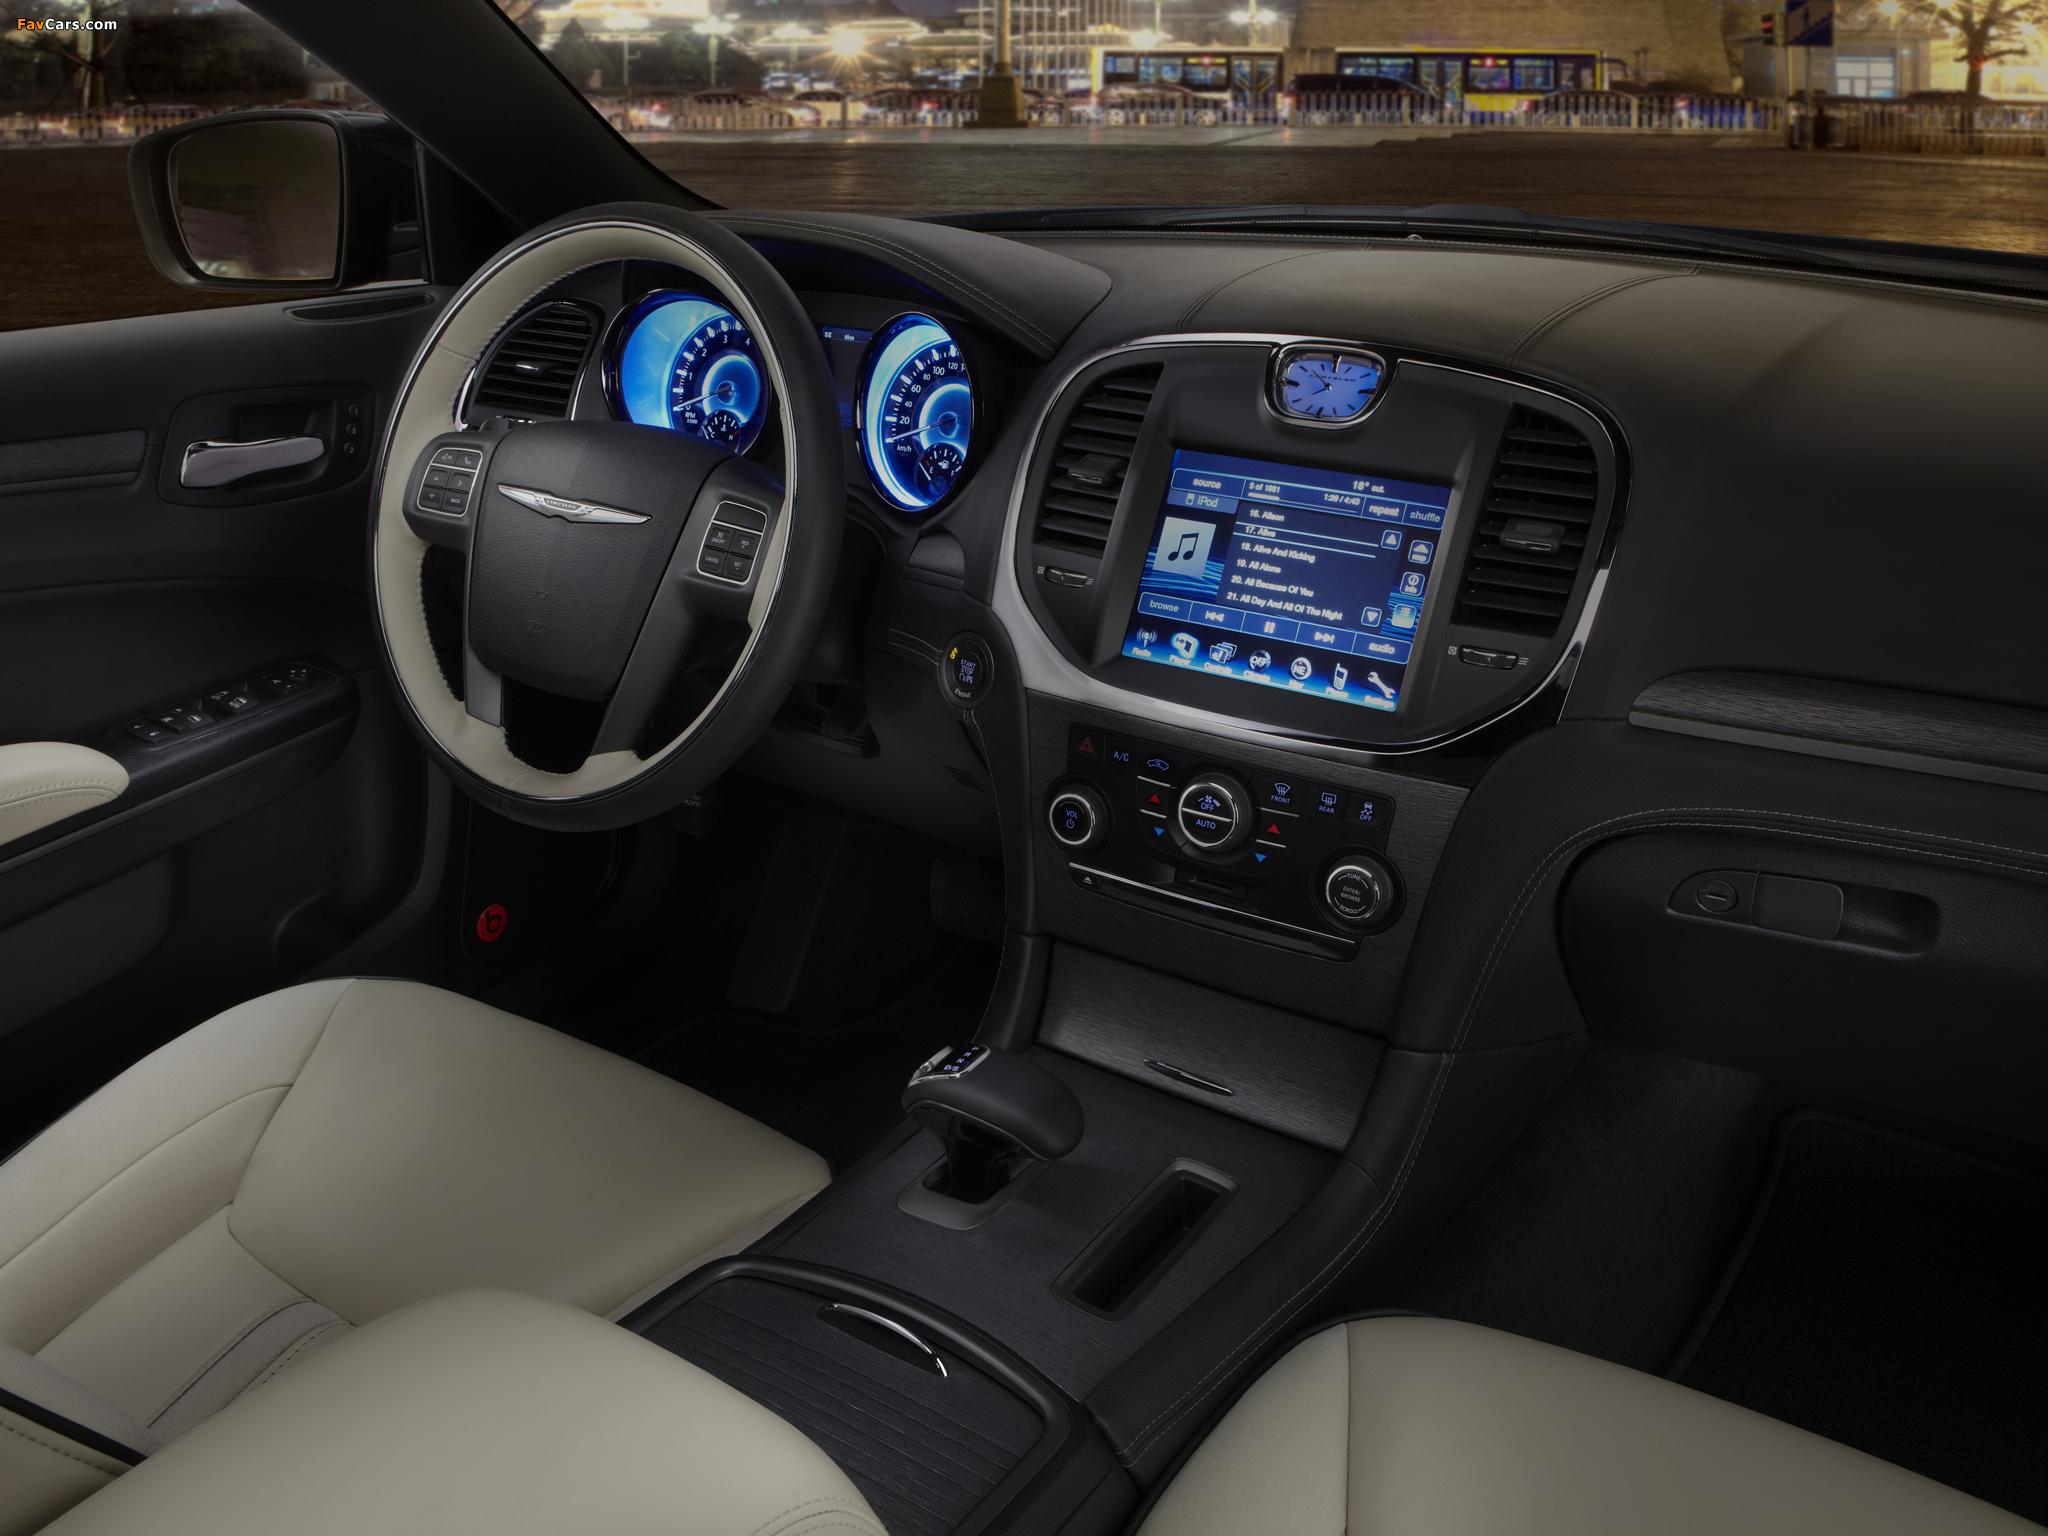 Chrysler 300 Ruyi Design Concept 2012 pictures (2048 x 1536)